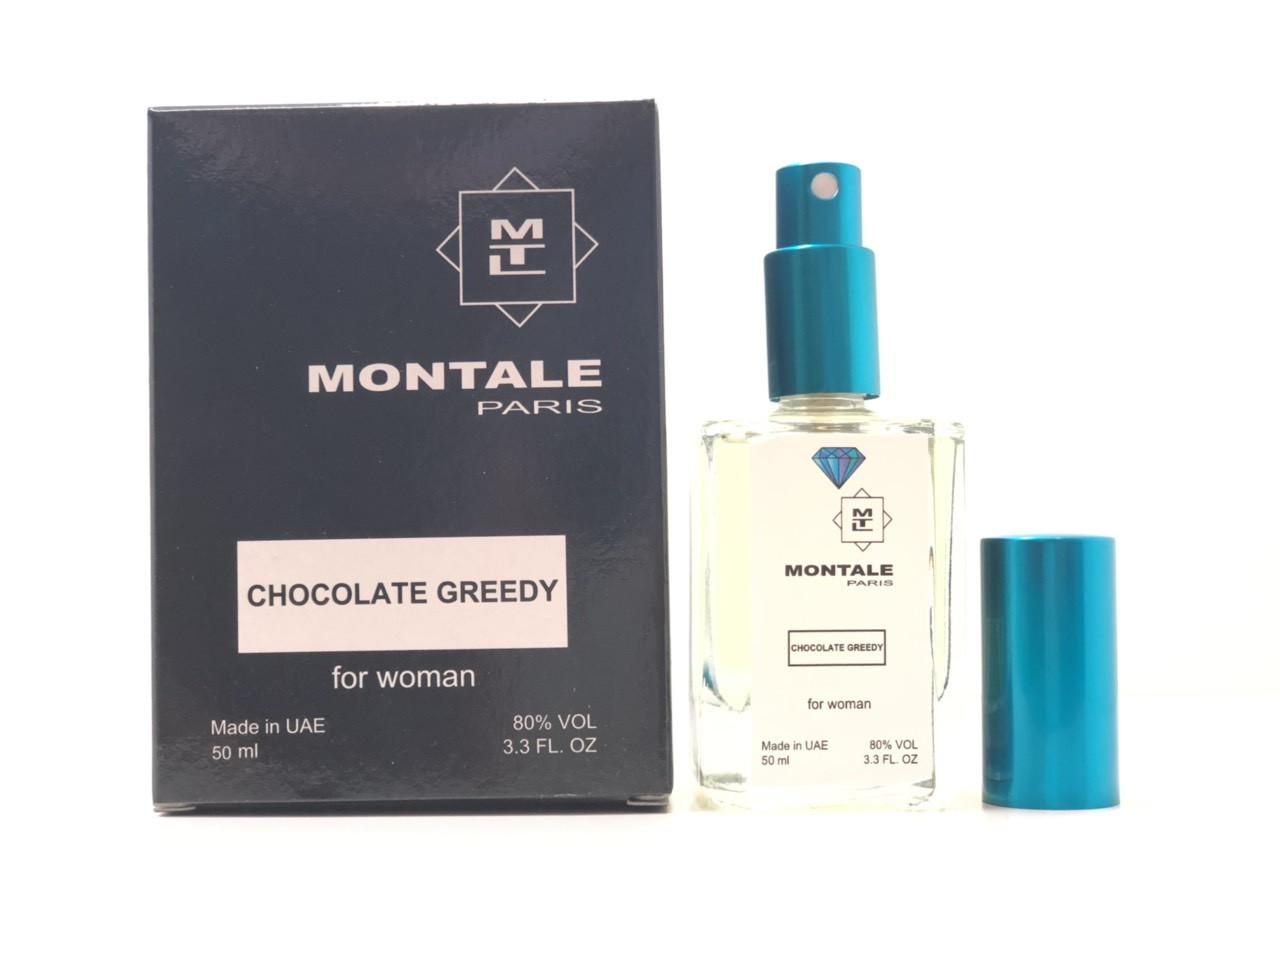 Парфюм Montale Chocolate Greedy (Монталь Шоколад Гриди) 50 мл Diamond - реплика